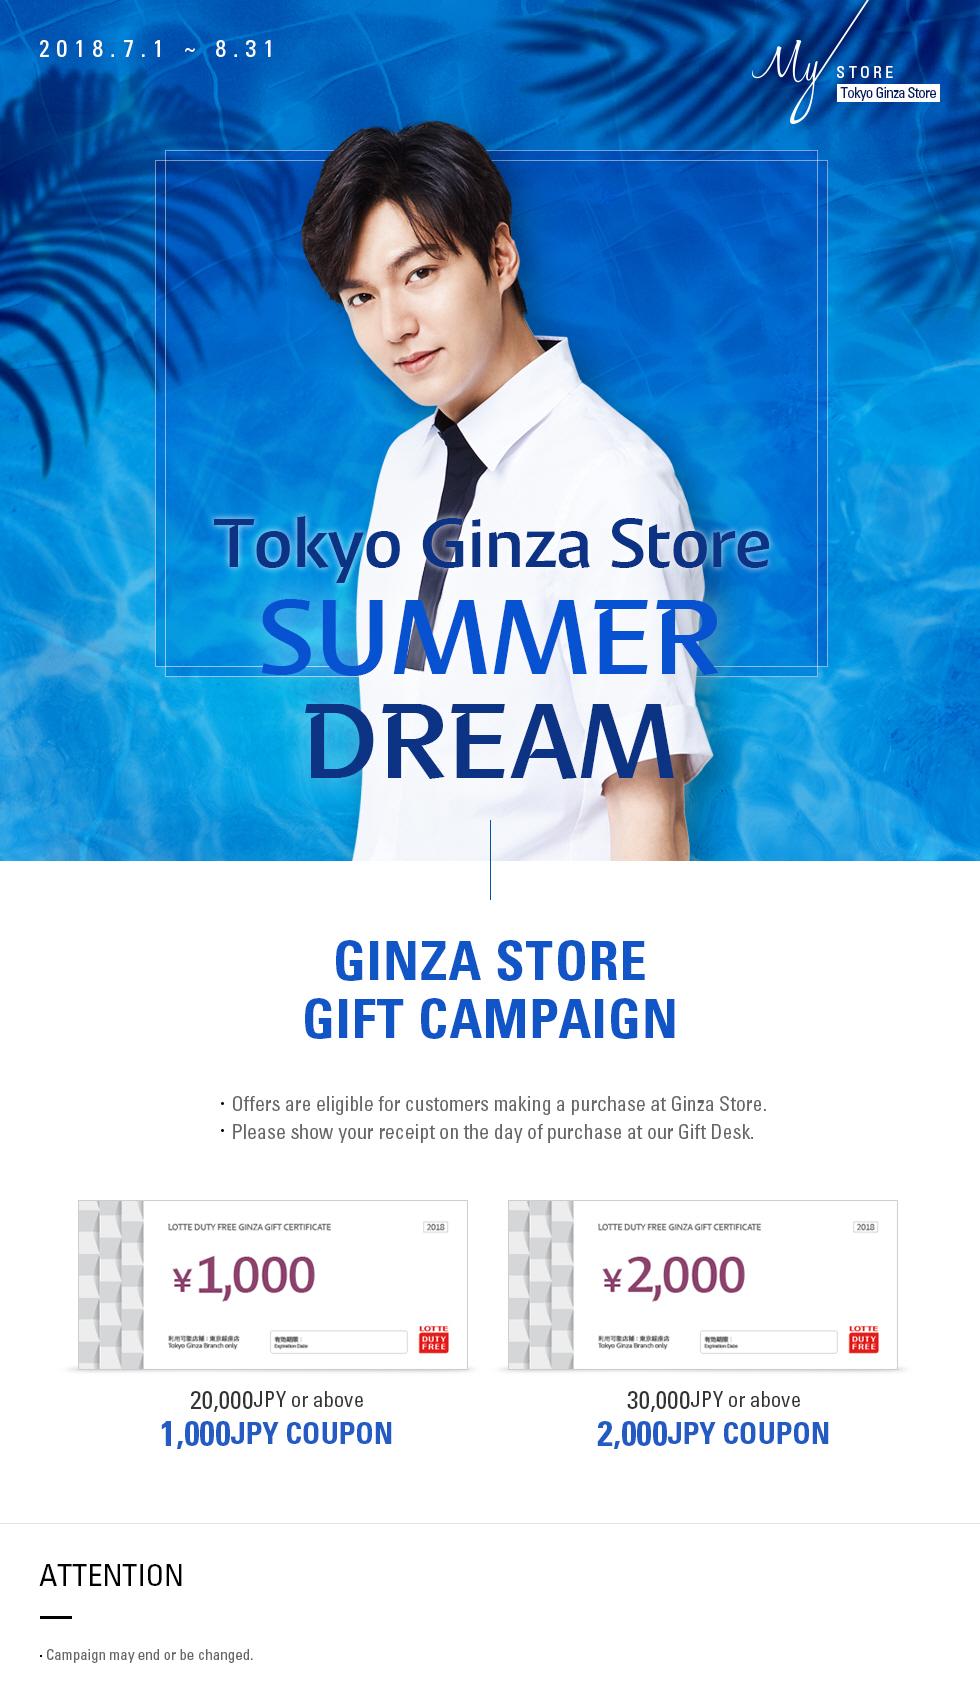 [Tokyo Ginza Store] SUMMER DREAM